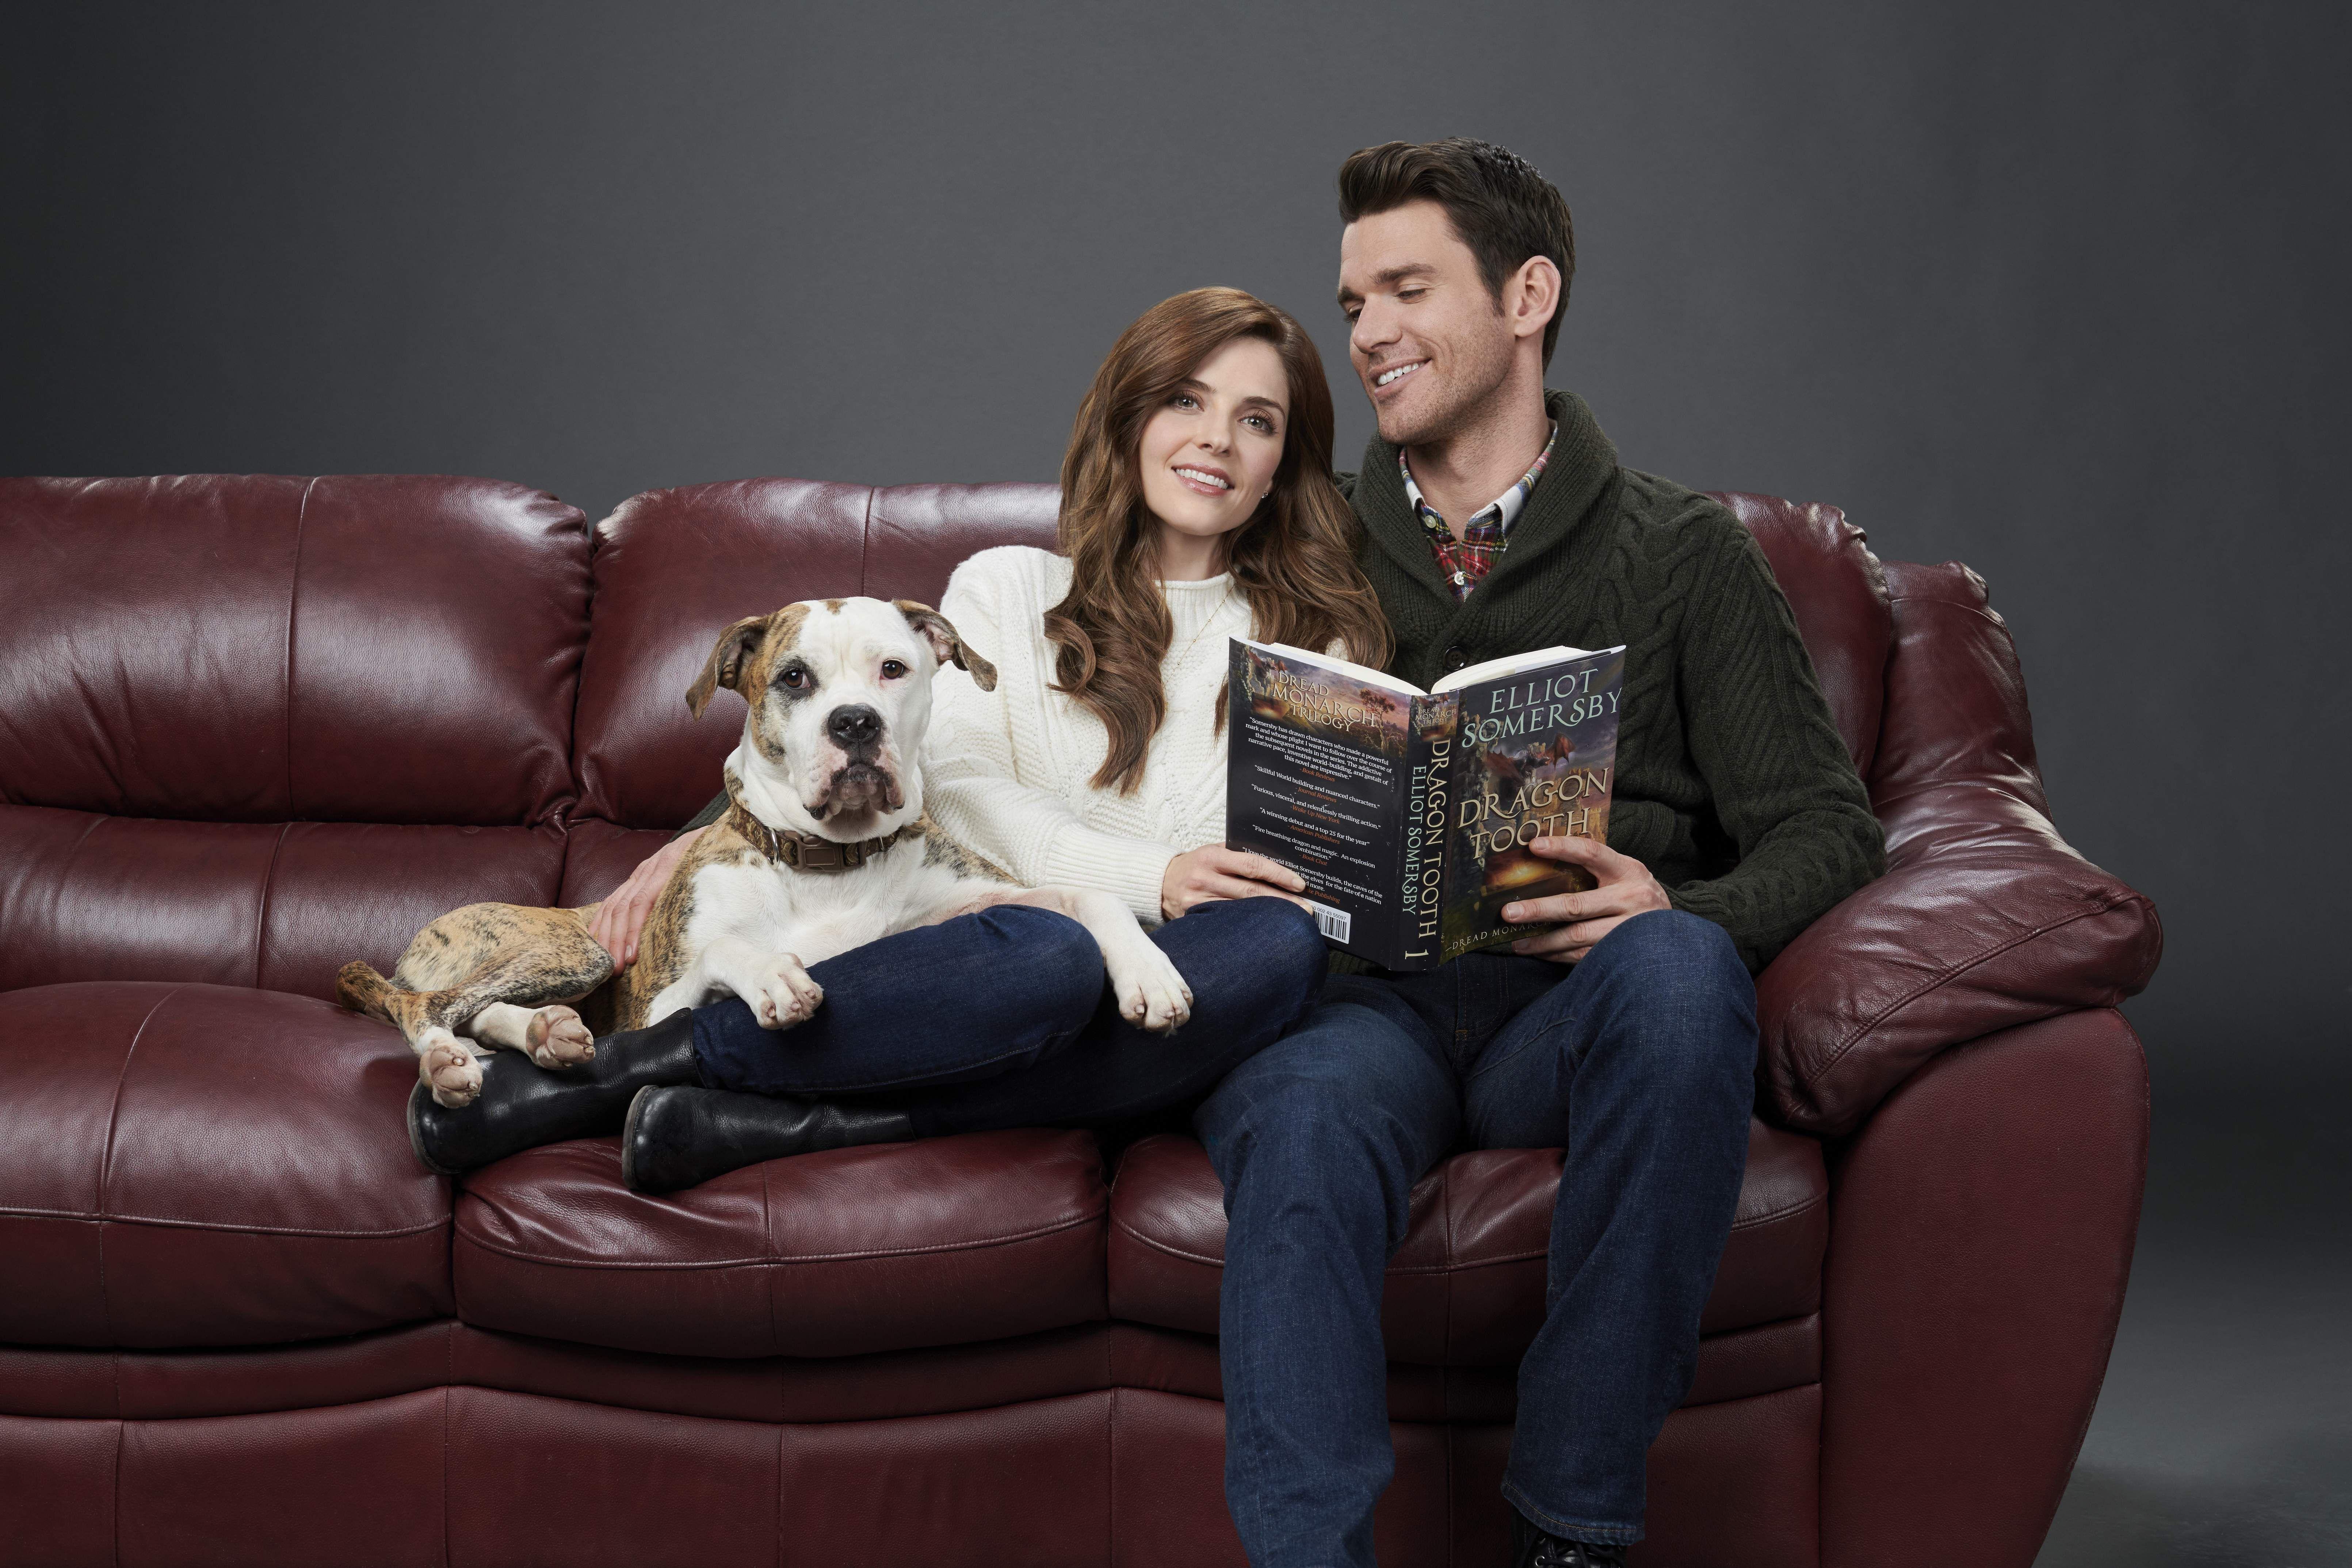 Hallmarks Winter Love Story Where Filmed Cast Movie Stars New Family Movies Hallmark Channel